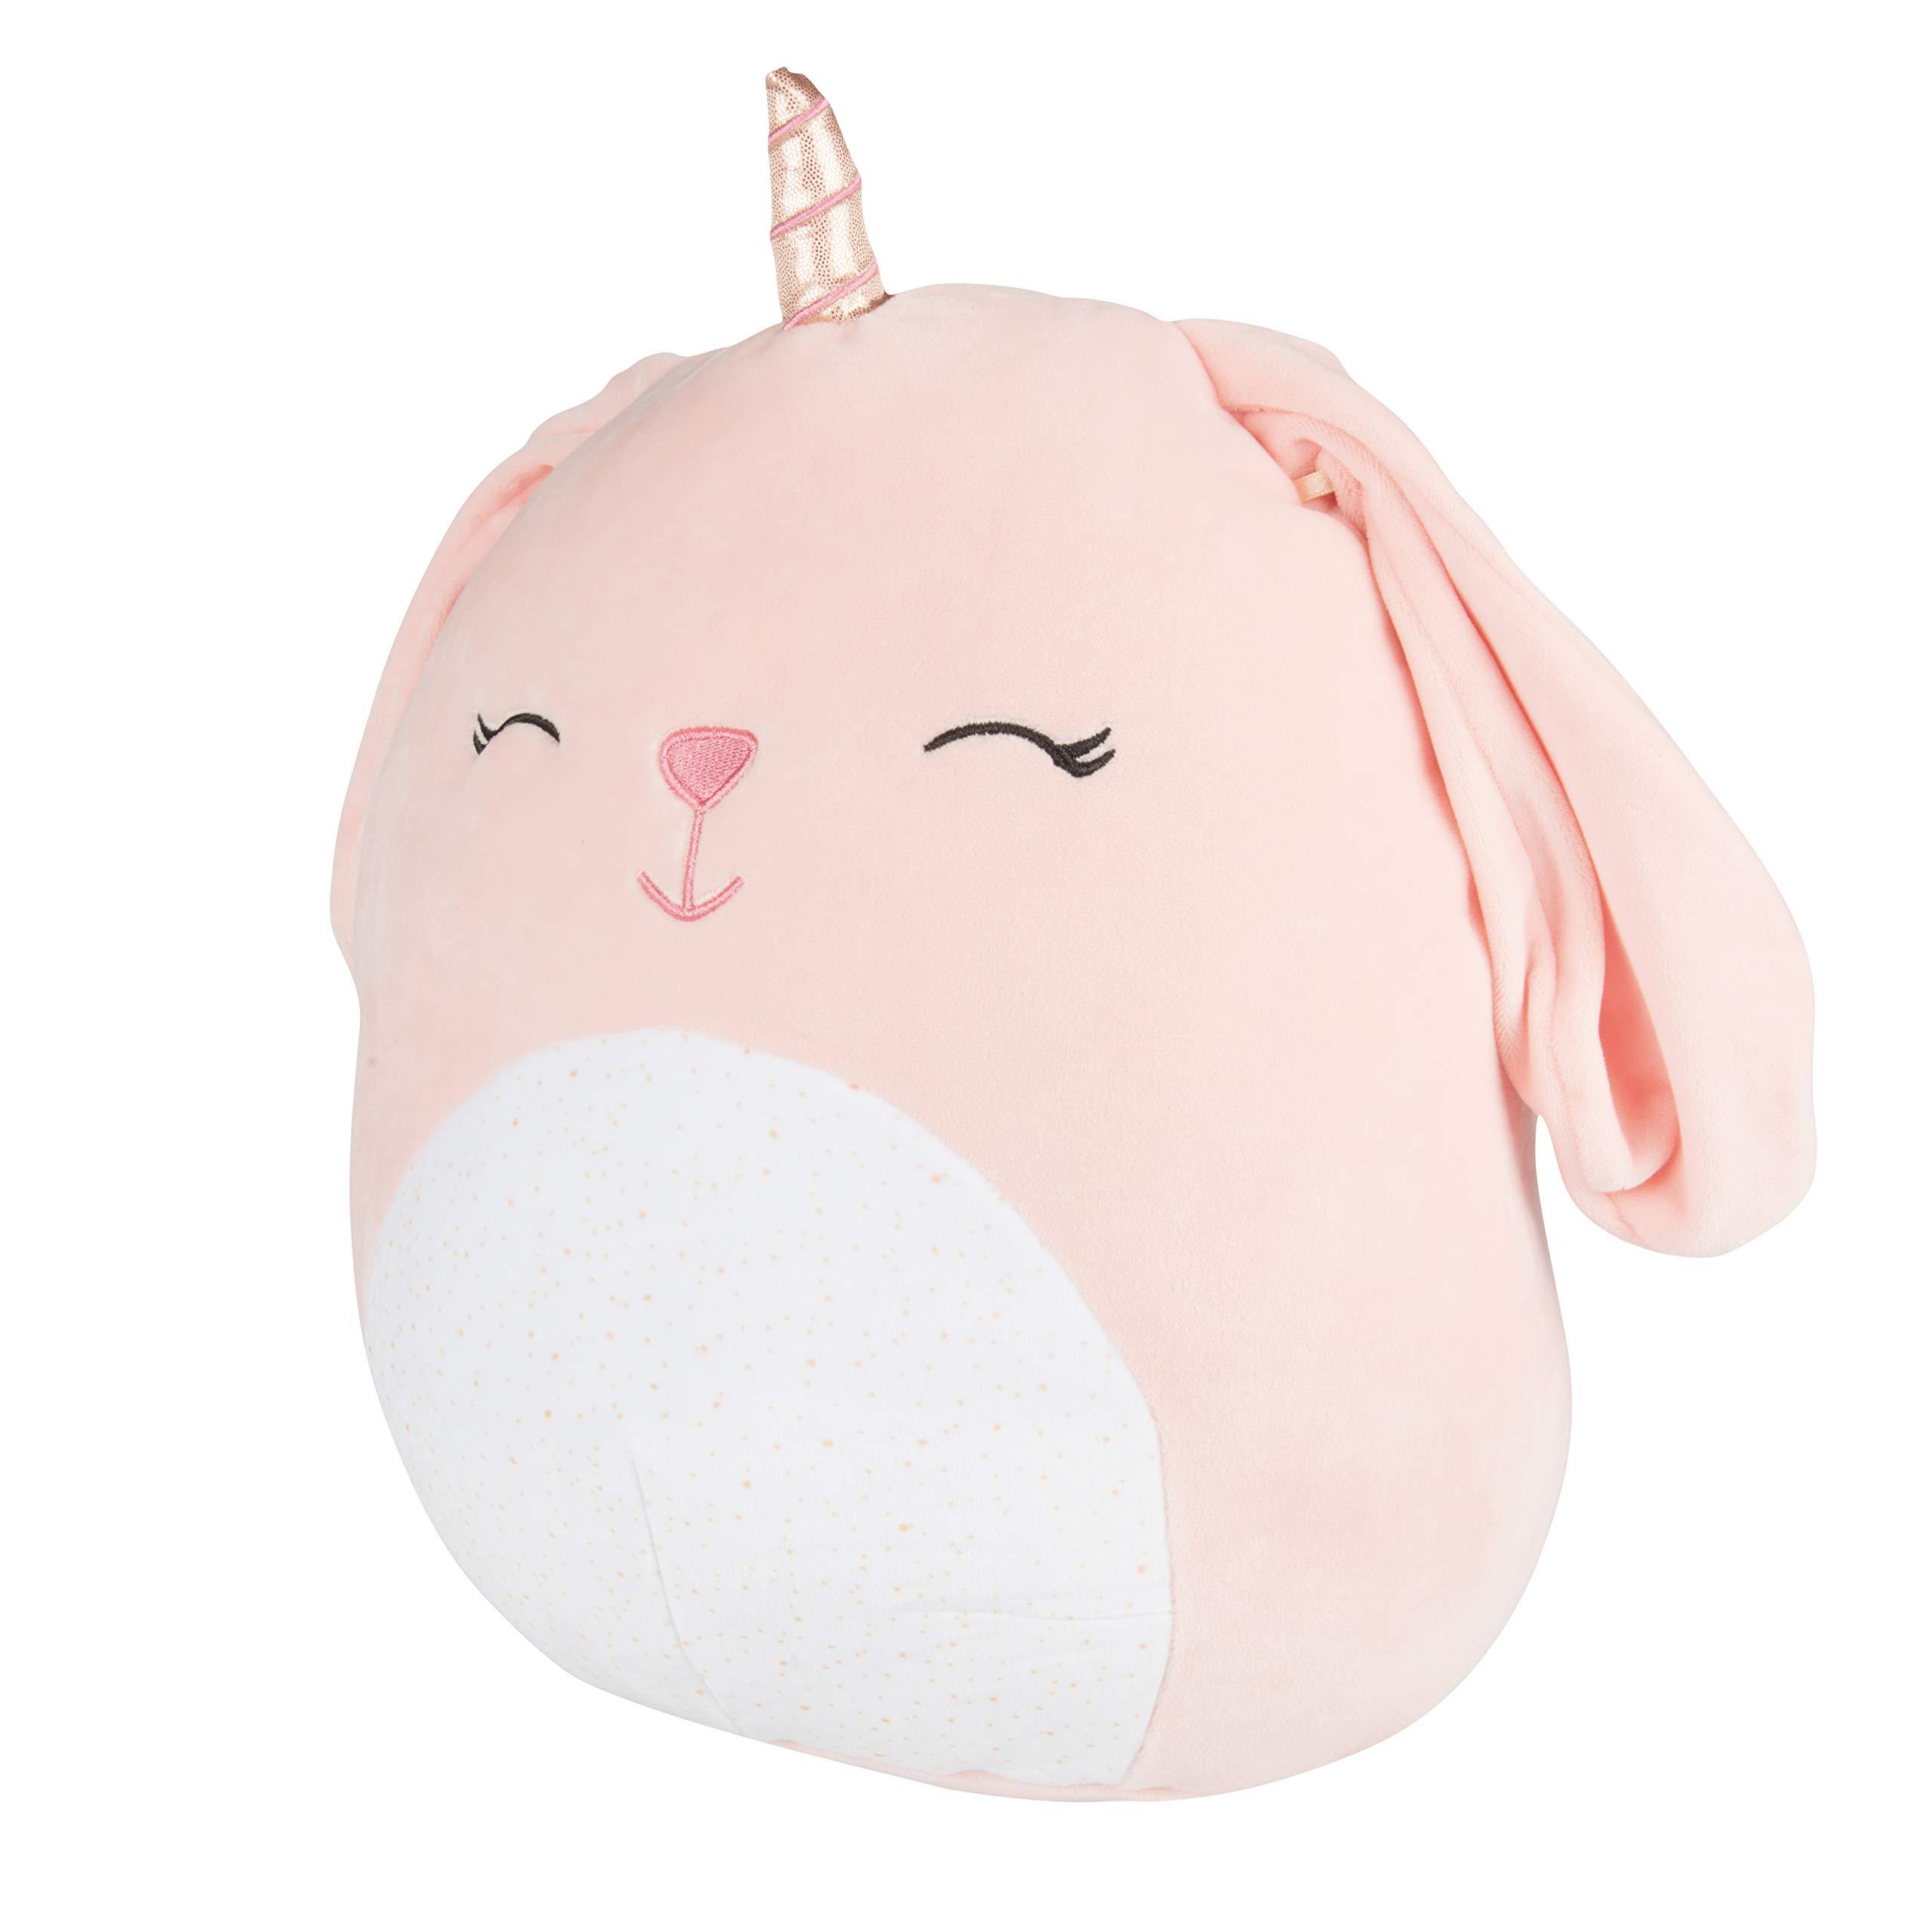 Squishmallows Super Soft Plush Soft Toy Cuddly Animals Assortment UK N8L4